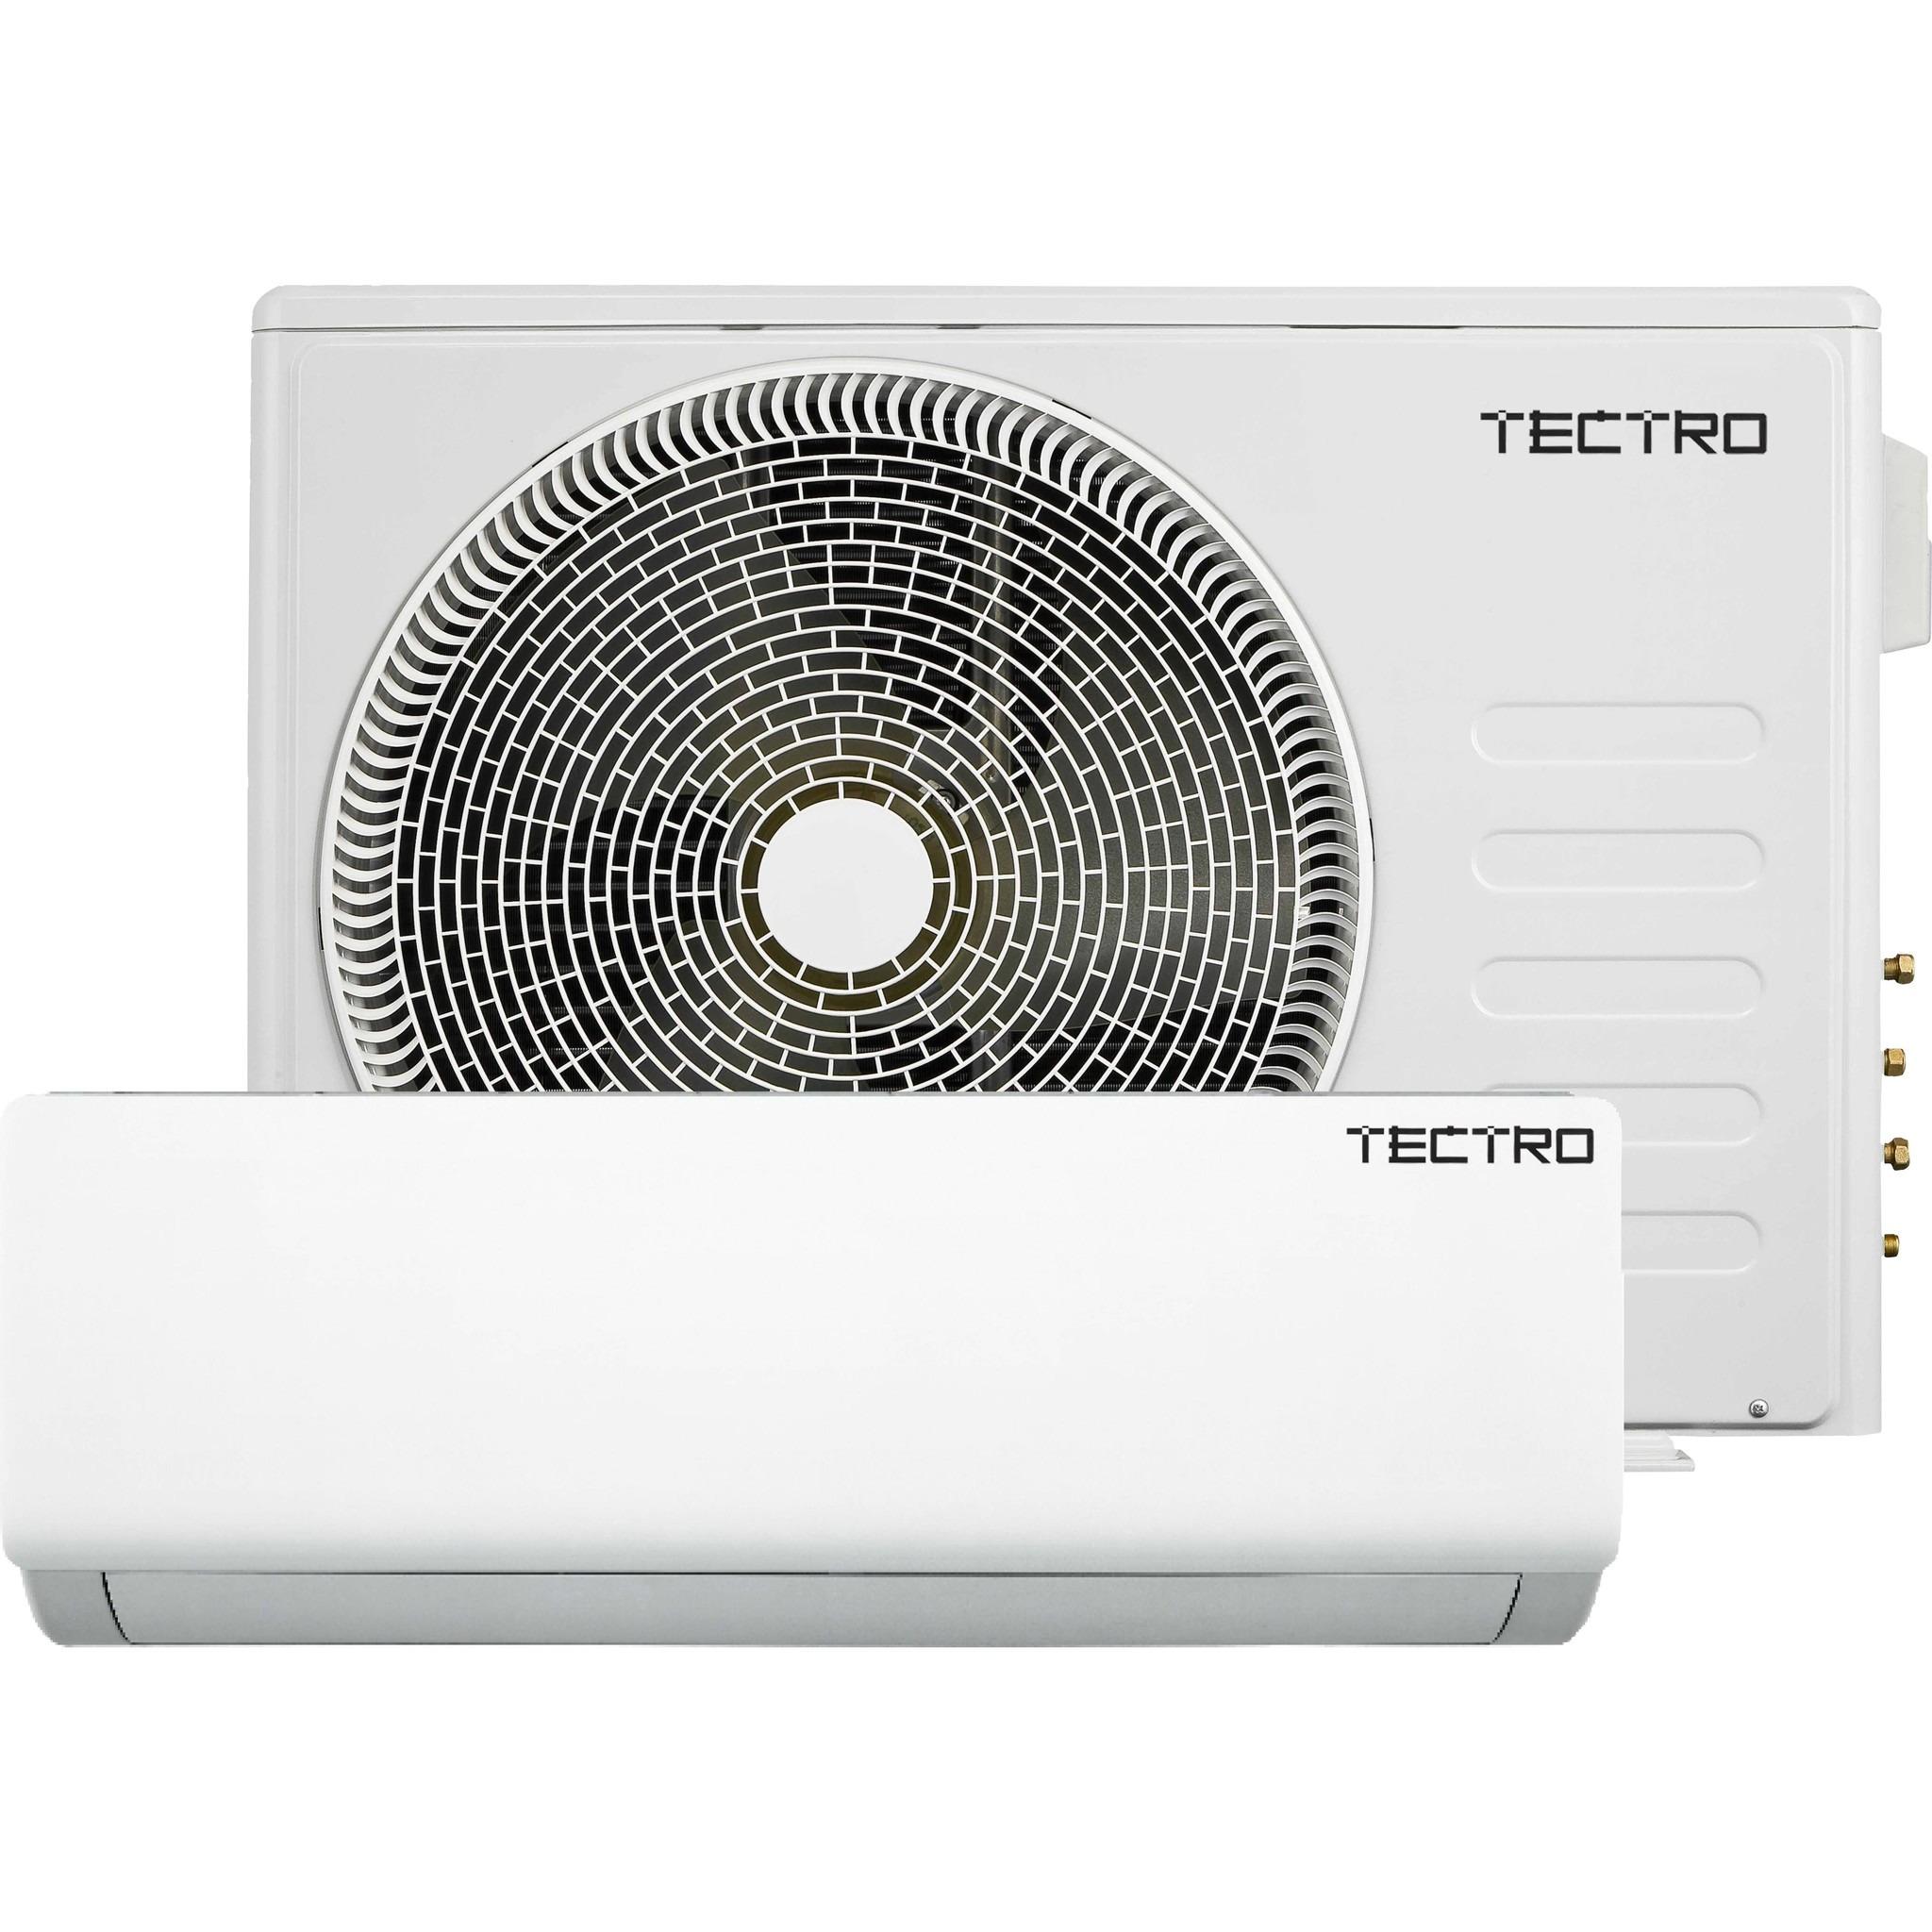 Tectro split unit airco TSCS 1025 compleet